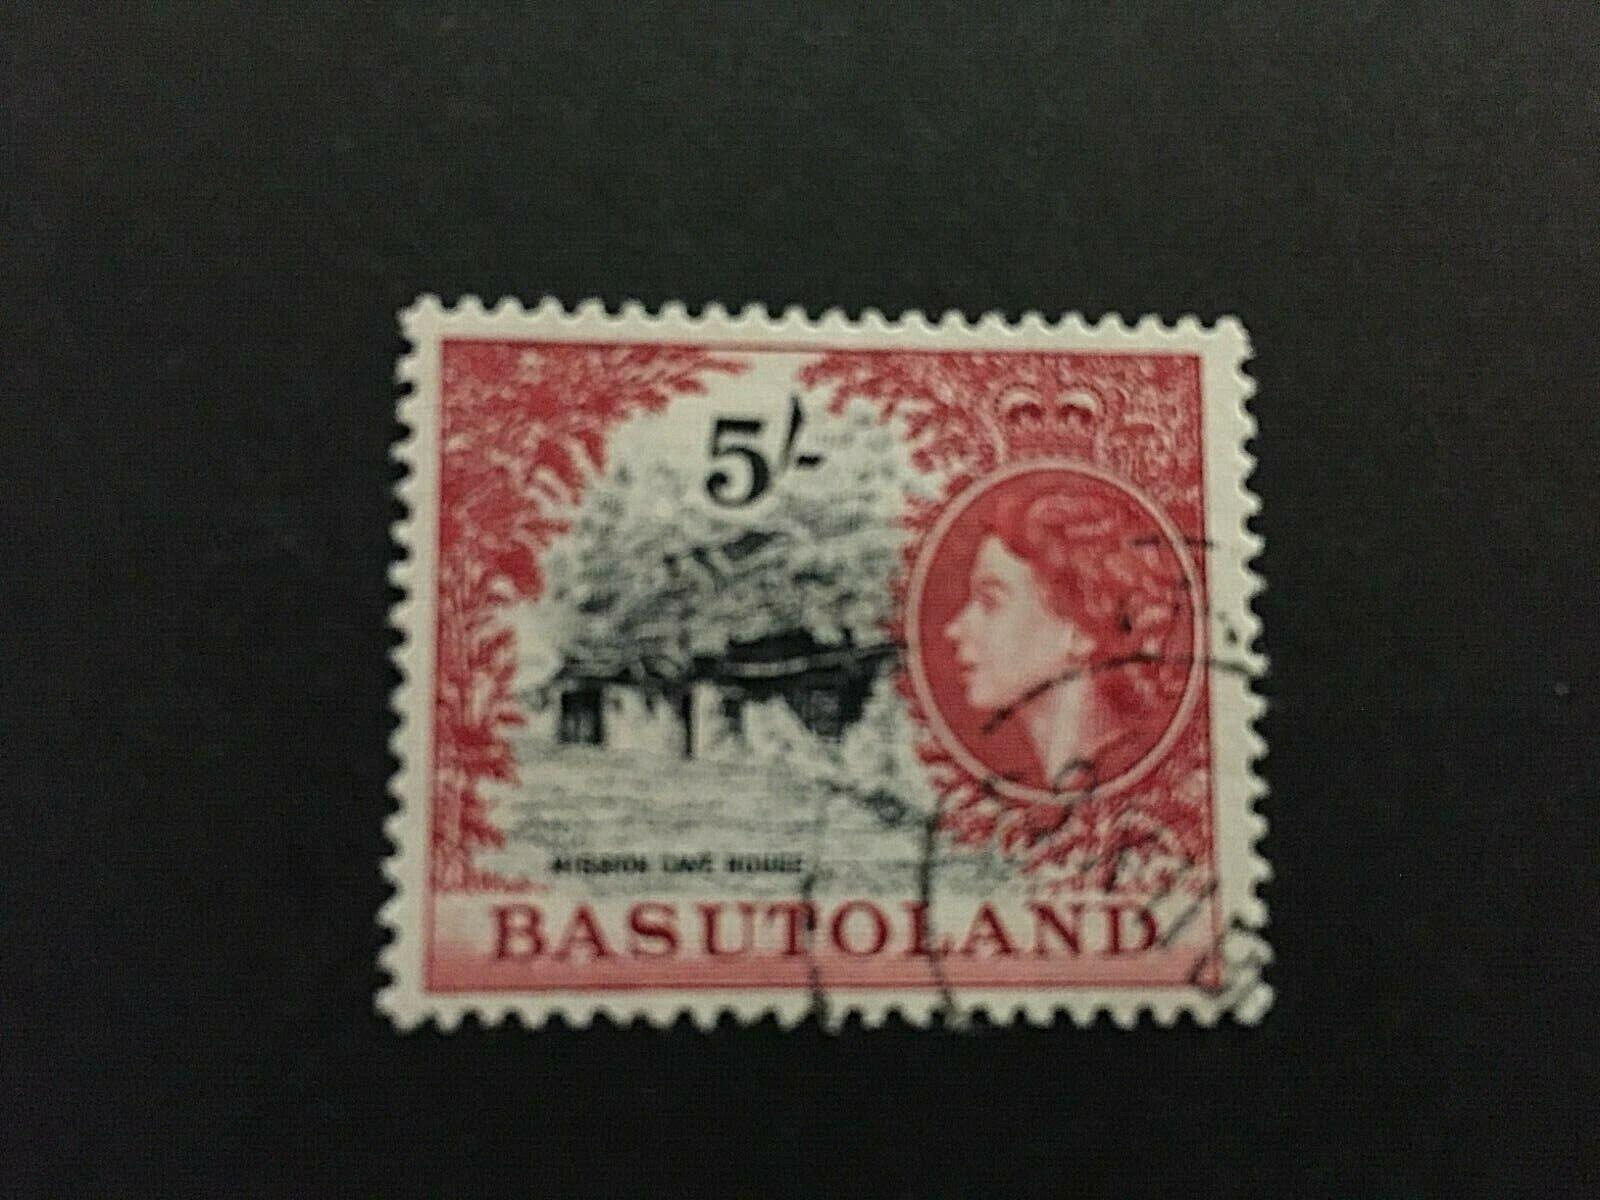 Basutoland: 1954, Queen Elizabeth definitive 5/-, SG 52, Fine used